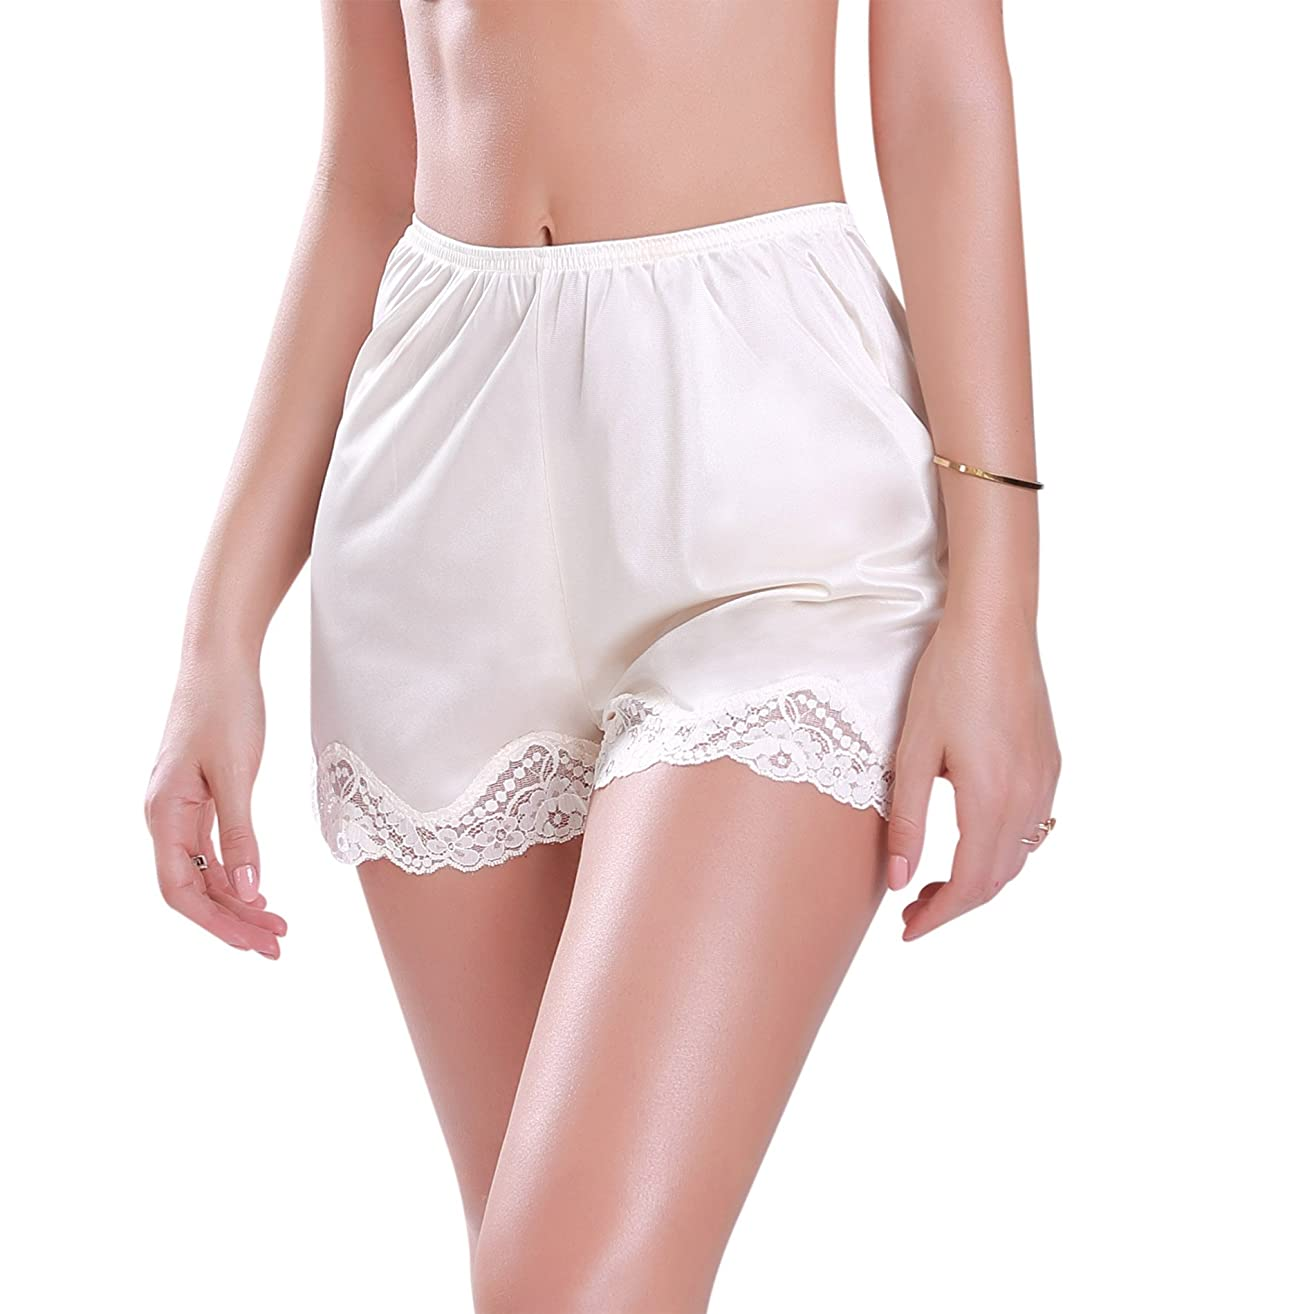 Ilusion 1039 - Women's Satin Bloomer Pettipant Short Slip